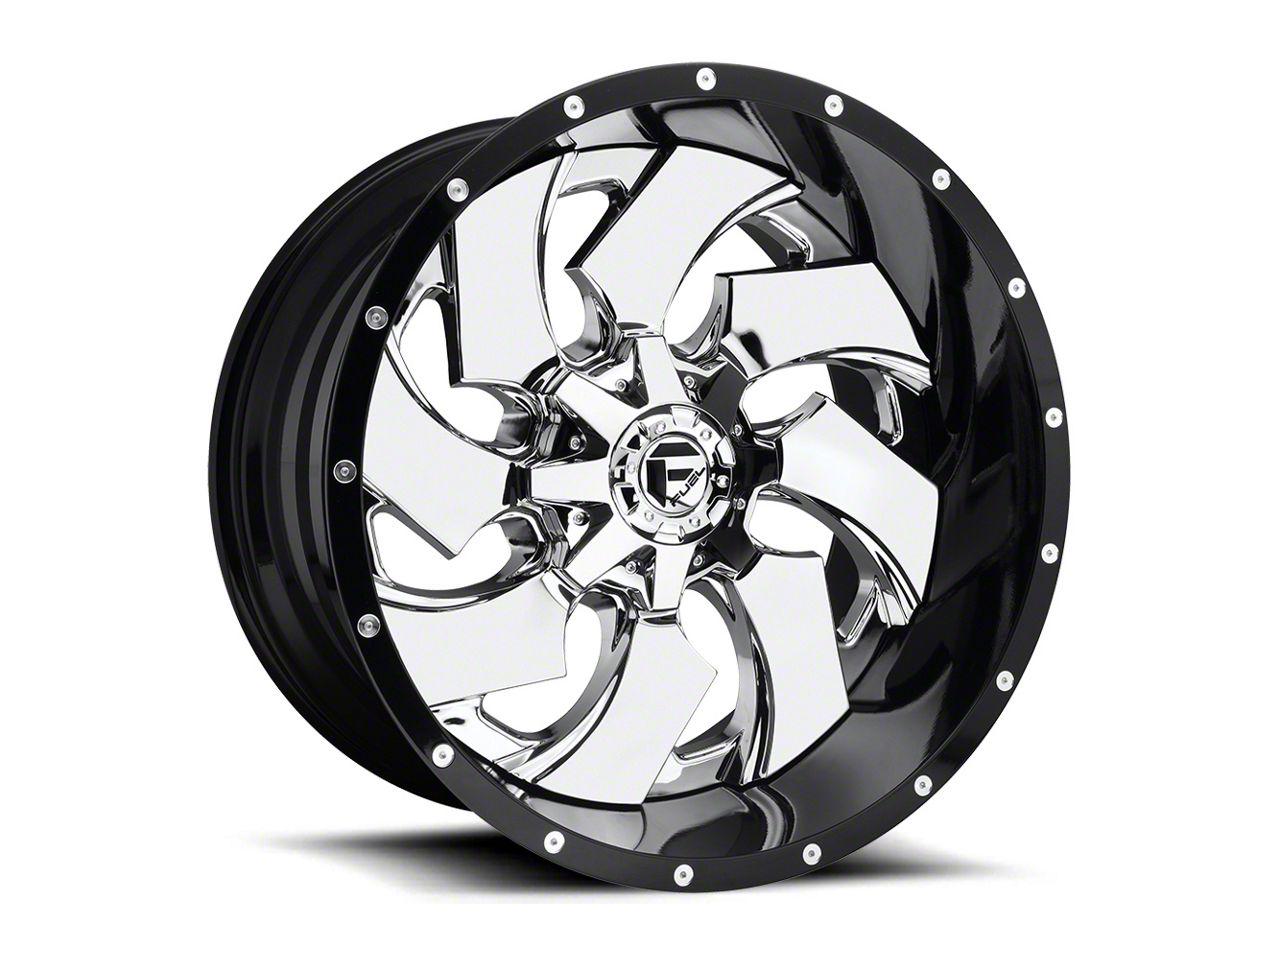 Fuel Wheels Cleaver Chrome 6-Lug Wheel - 24x16 (04-18 F-150)